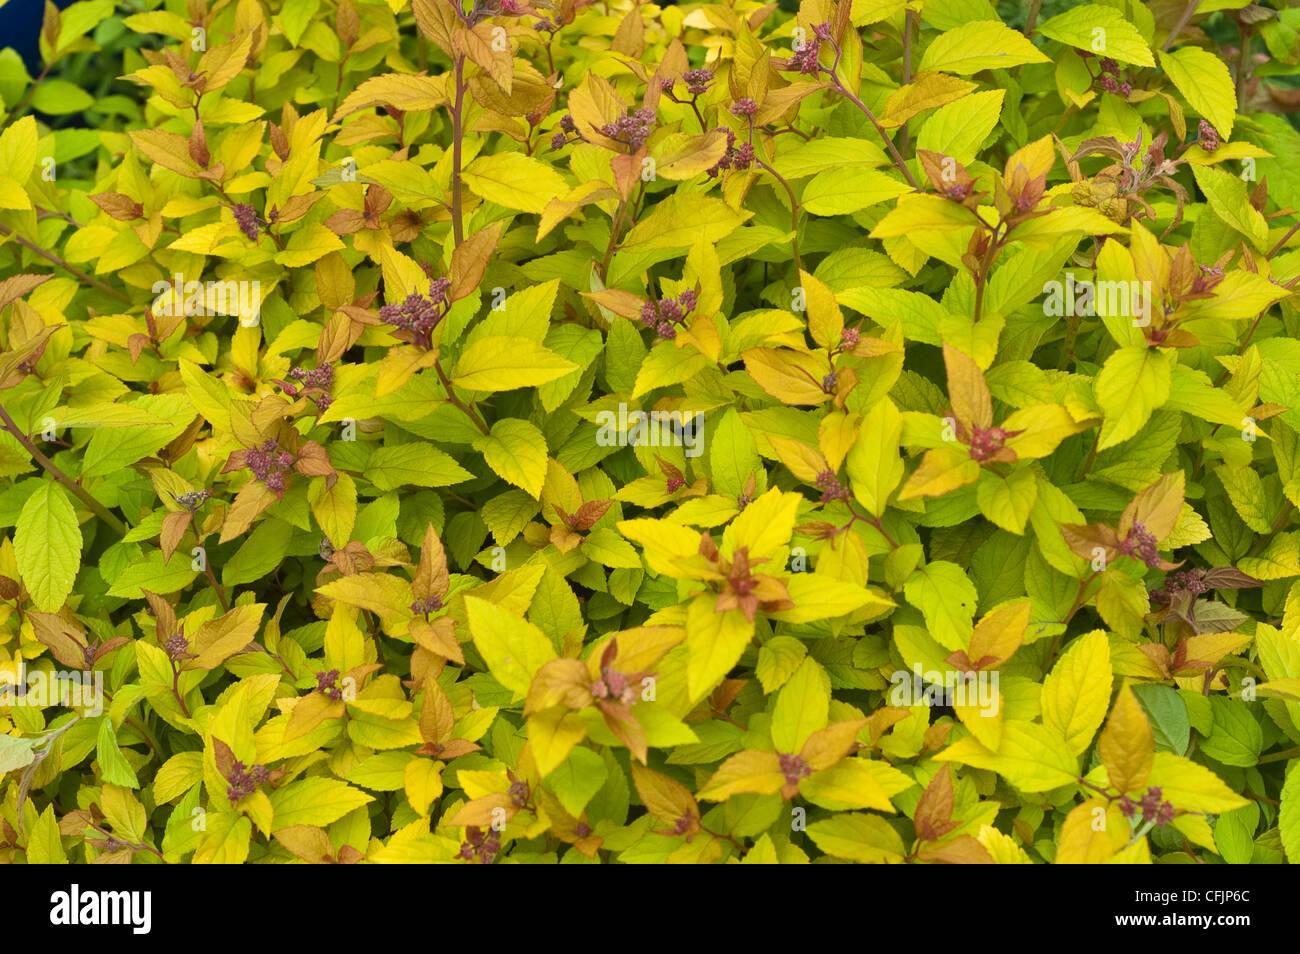 Spirea Foliage Photos Spirea Foliage Images Alamy